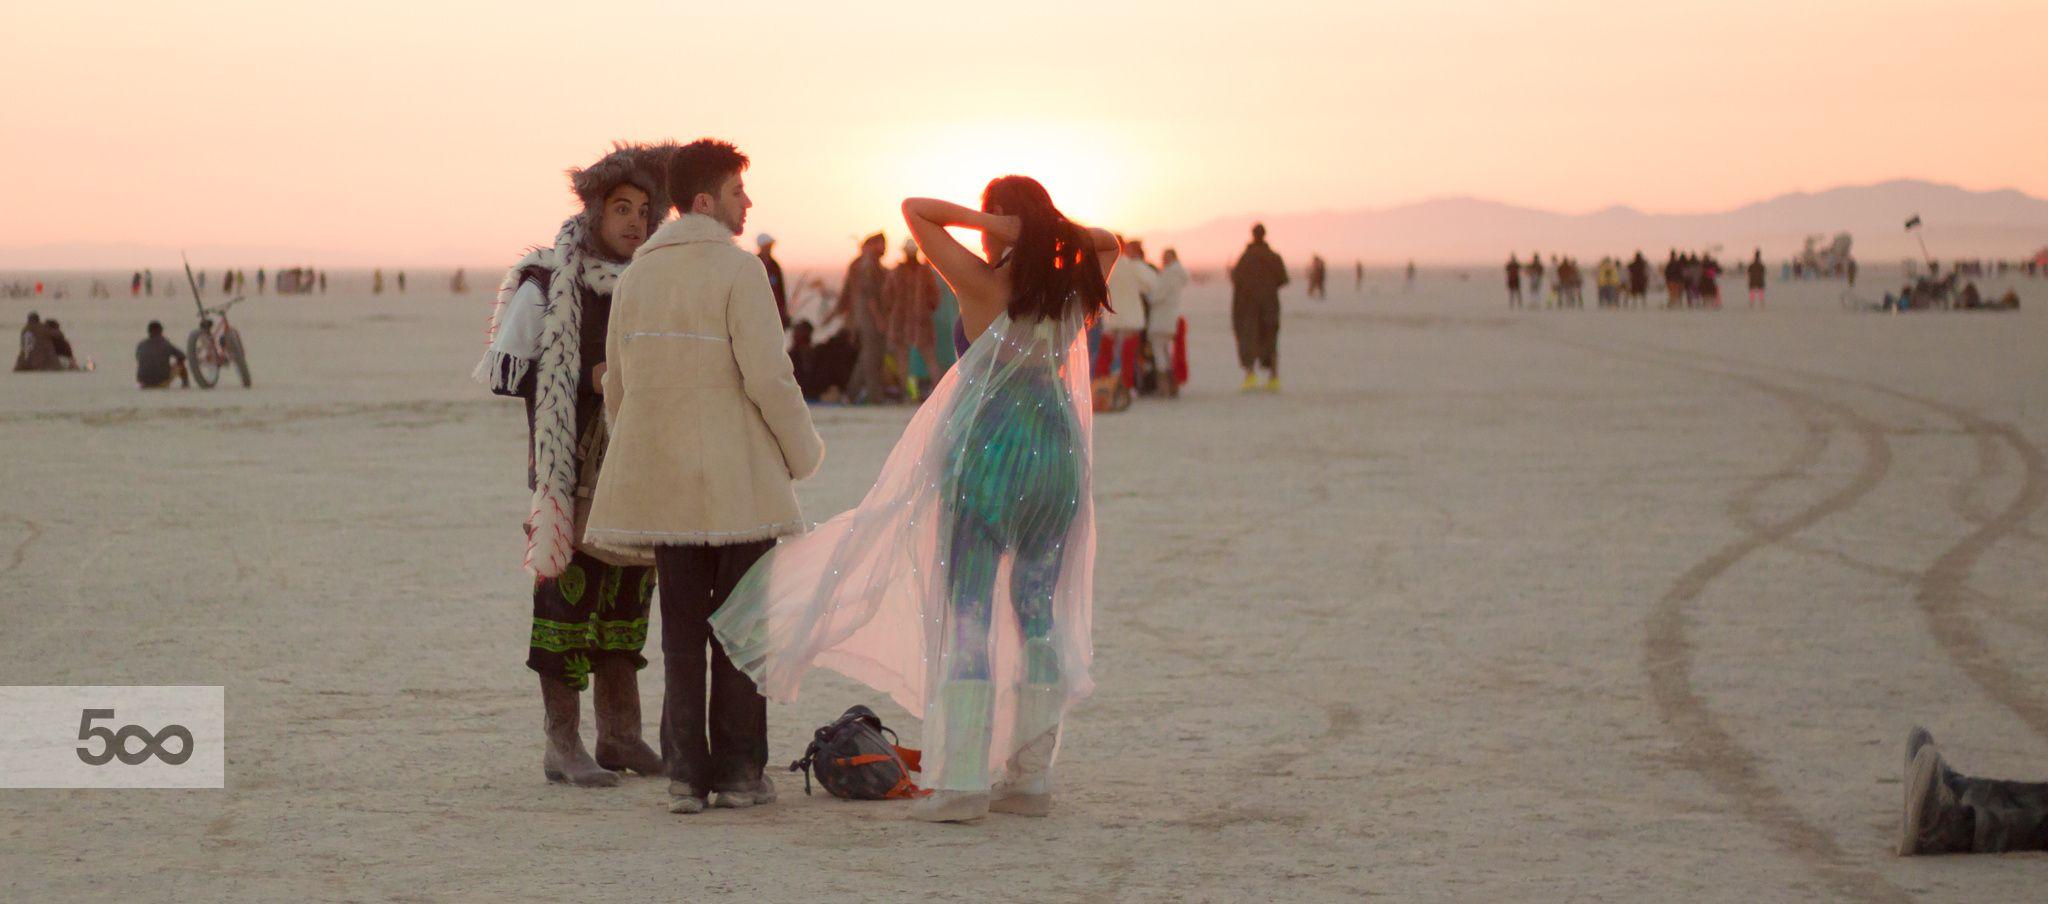 Photograph Burning Man 2015 by Daria Krylova on 500px